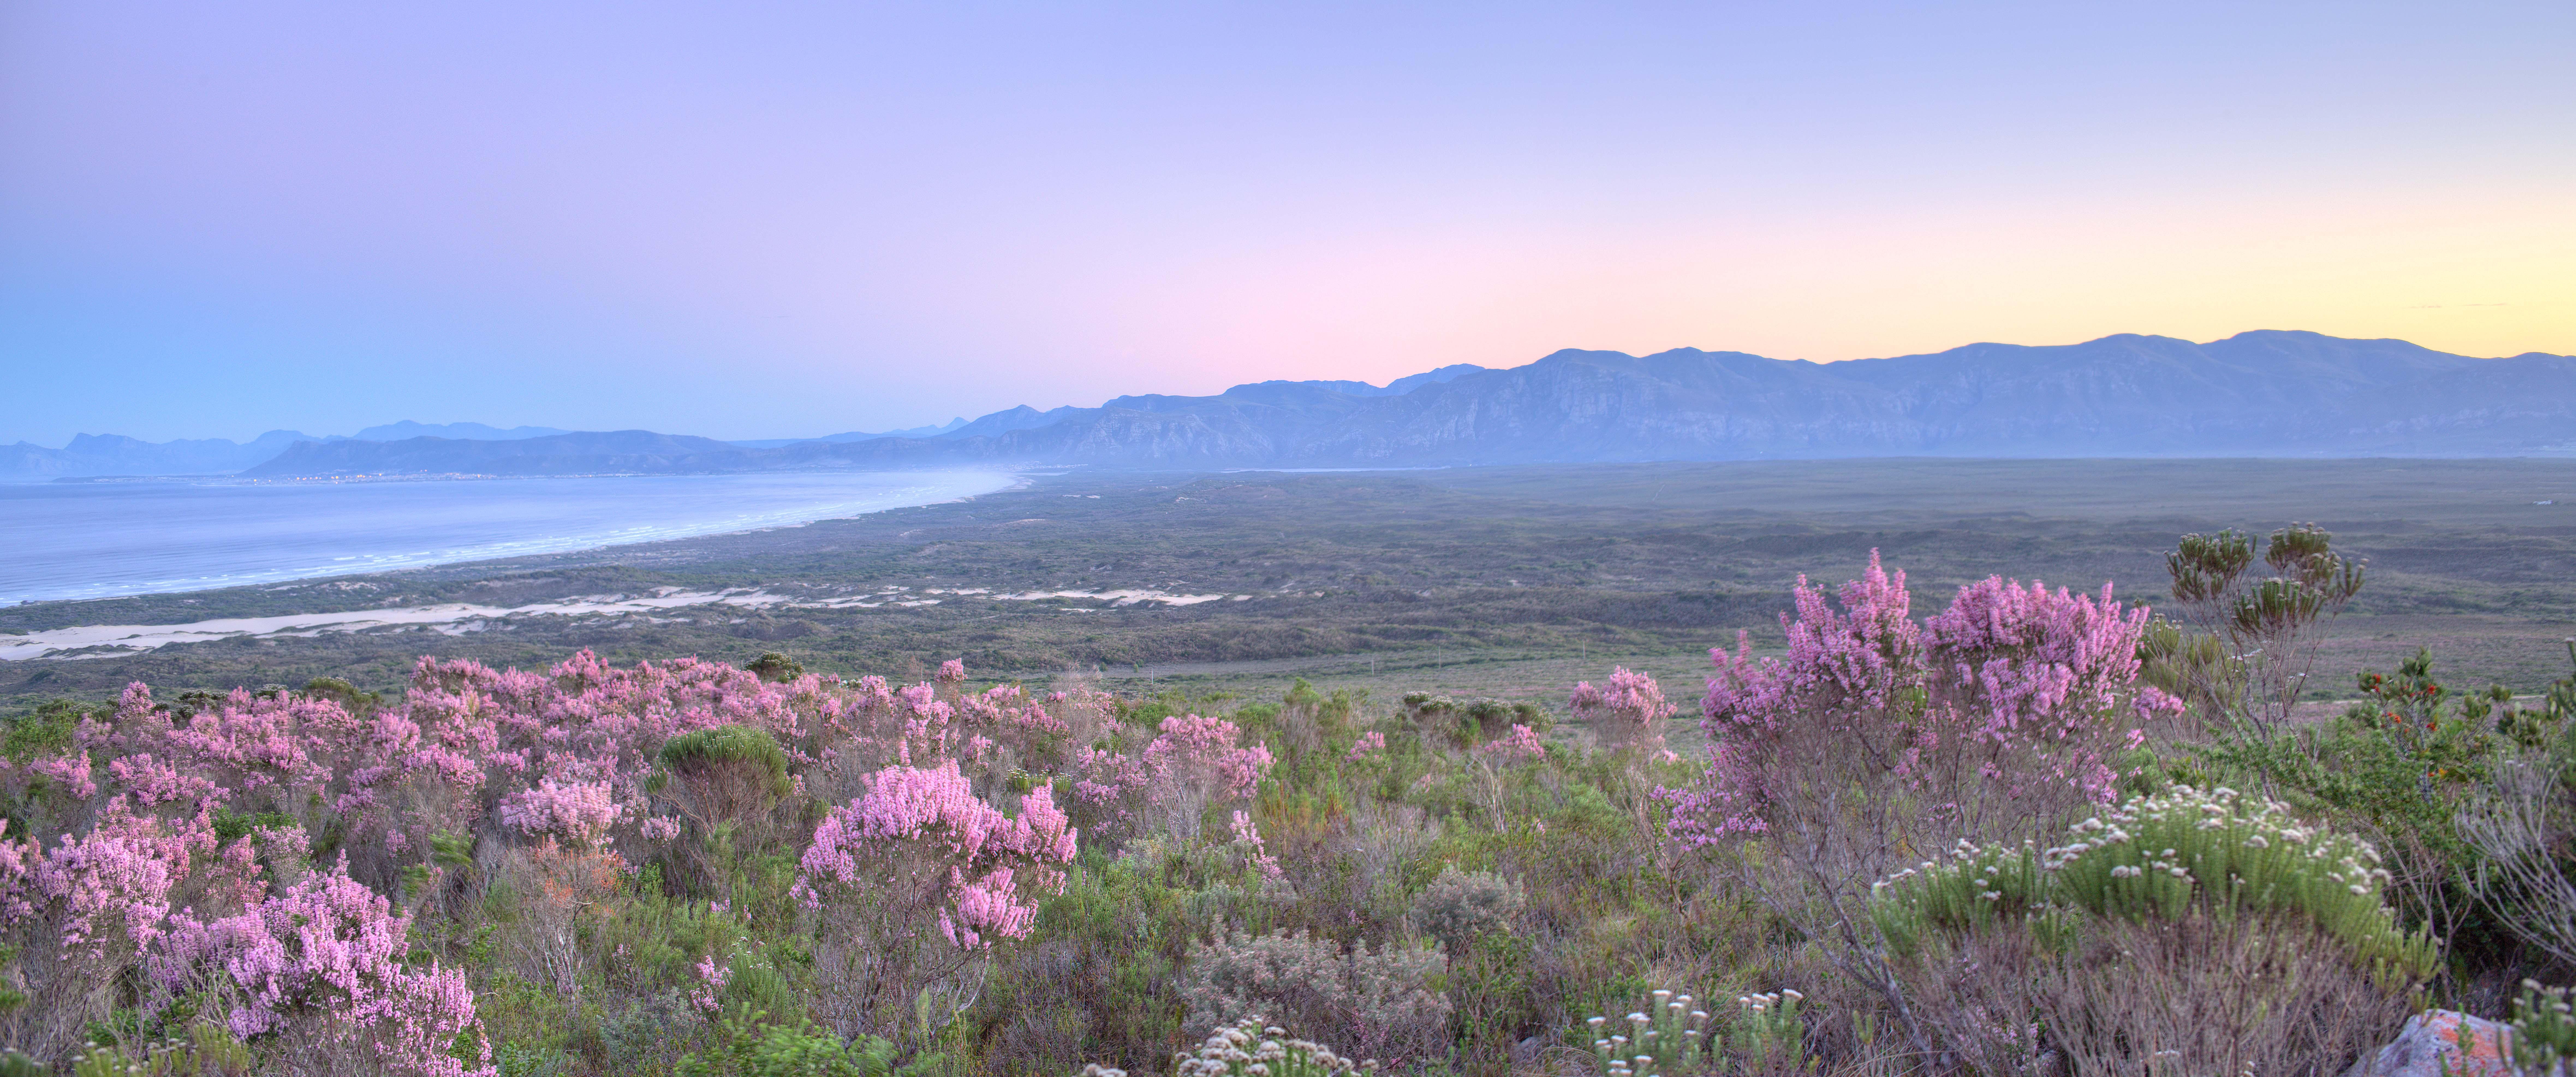 grootbos-floral-cape-kingdom